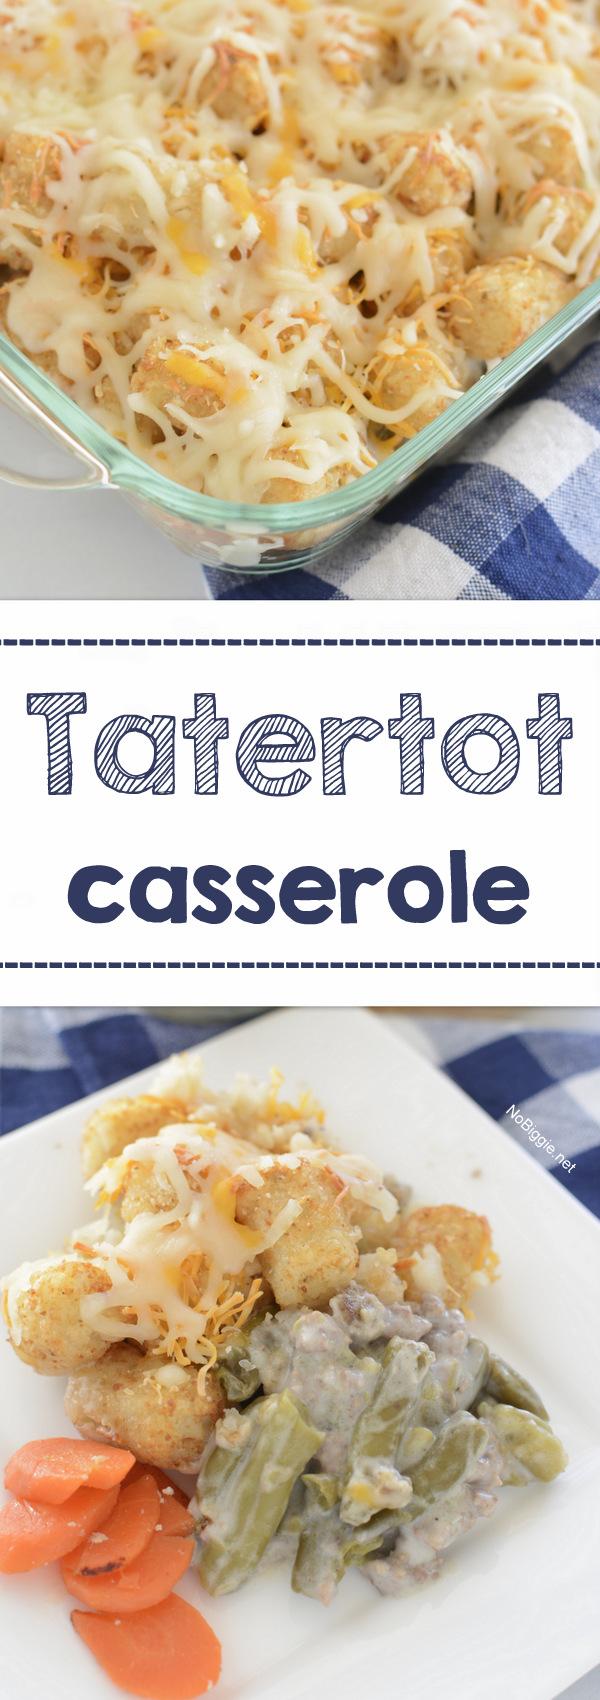 http://www.nobiggie.net/wp-content/uploads/2016/09/Easy-Tatertot-casserole-NoBiggie.net_.jpg